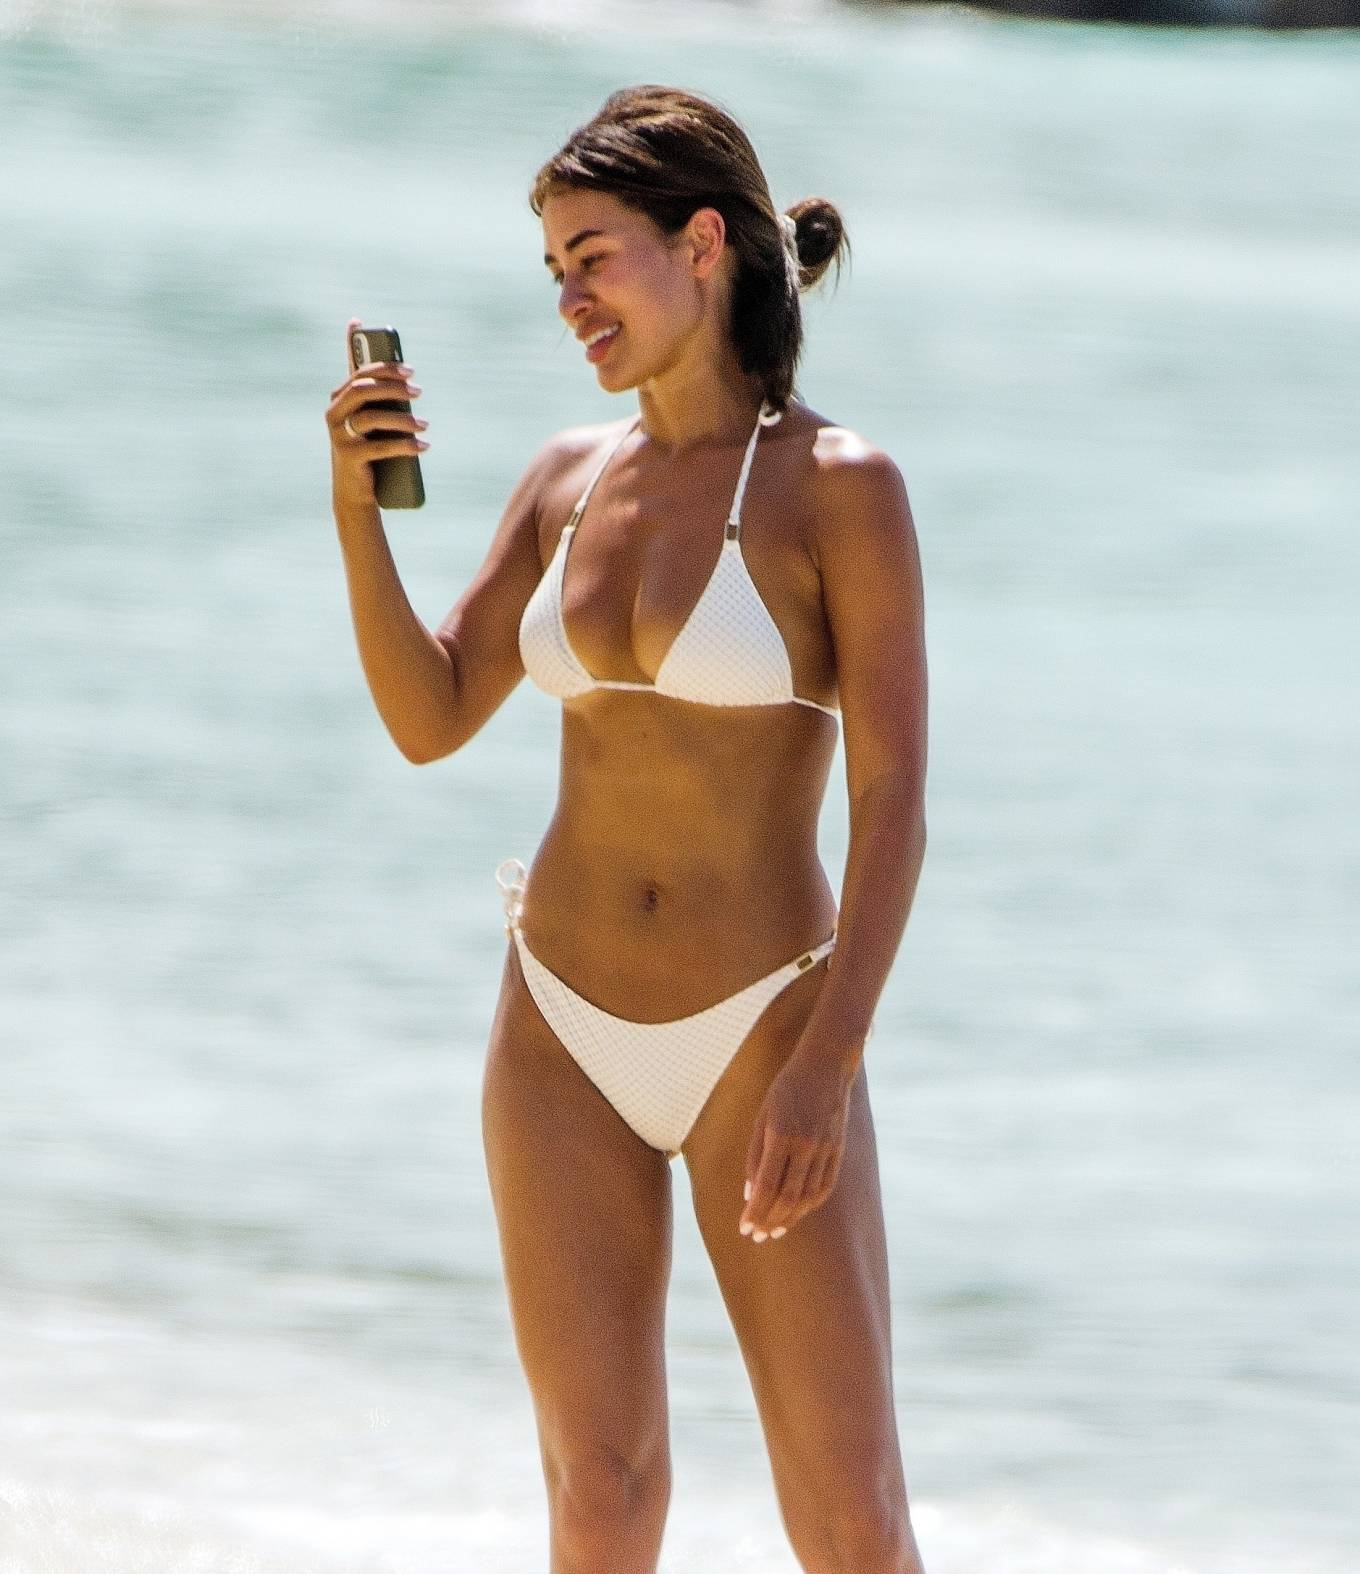 Montana Brown - In a white bikini at a beach in Barbados